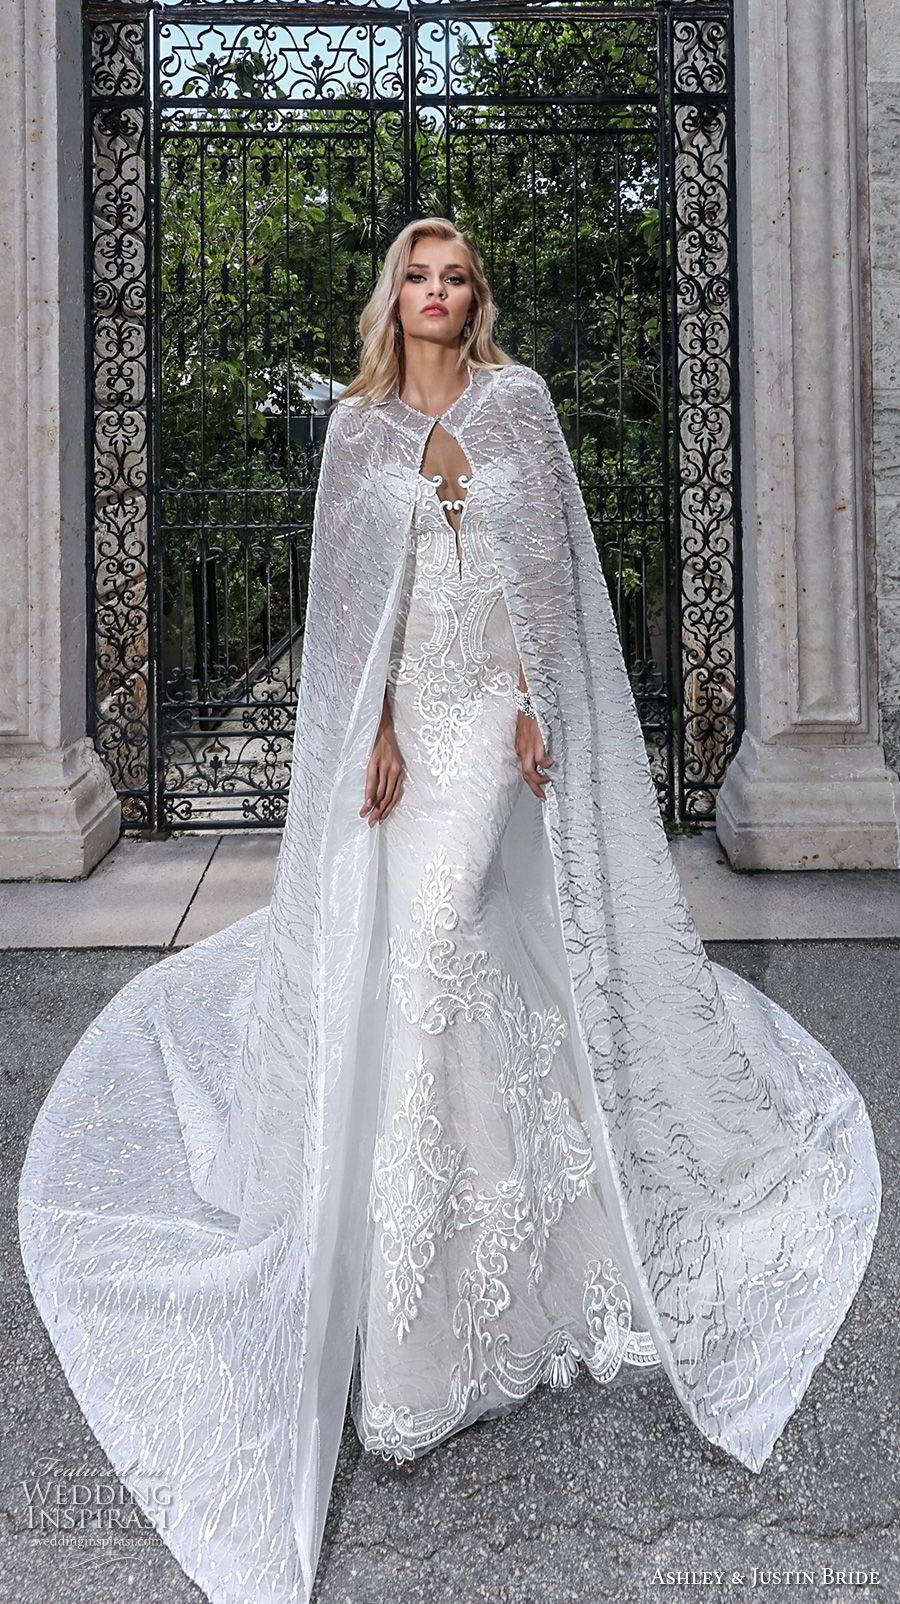 ashley justin spring 2018 bridal strapless deep plunging sweetheart neckline full embellishment elegant glamorous fit and flare wedding dress with cape long train (8) mv